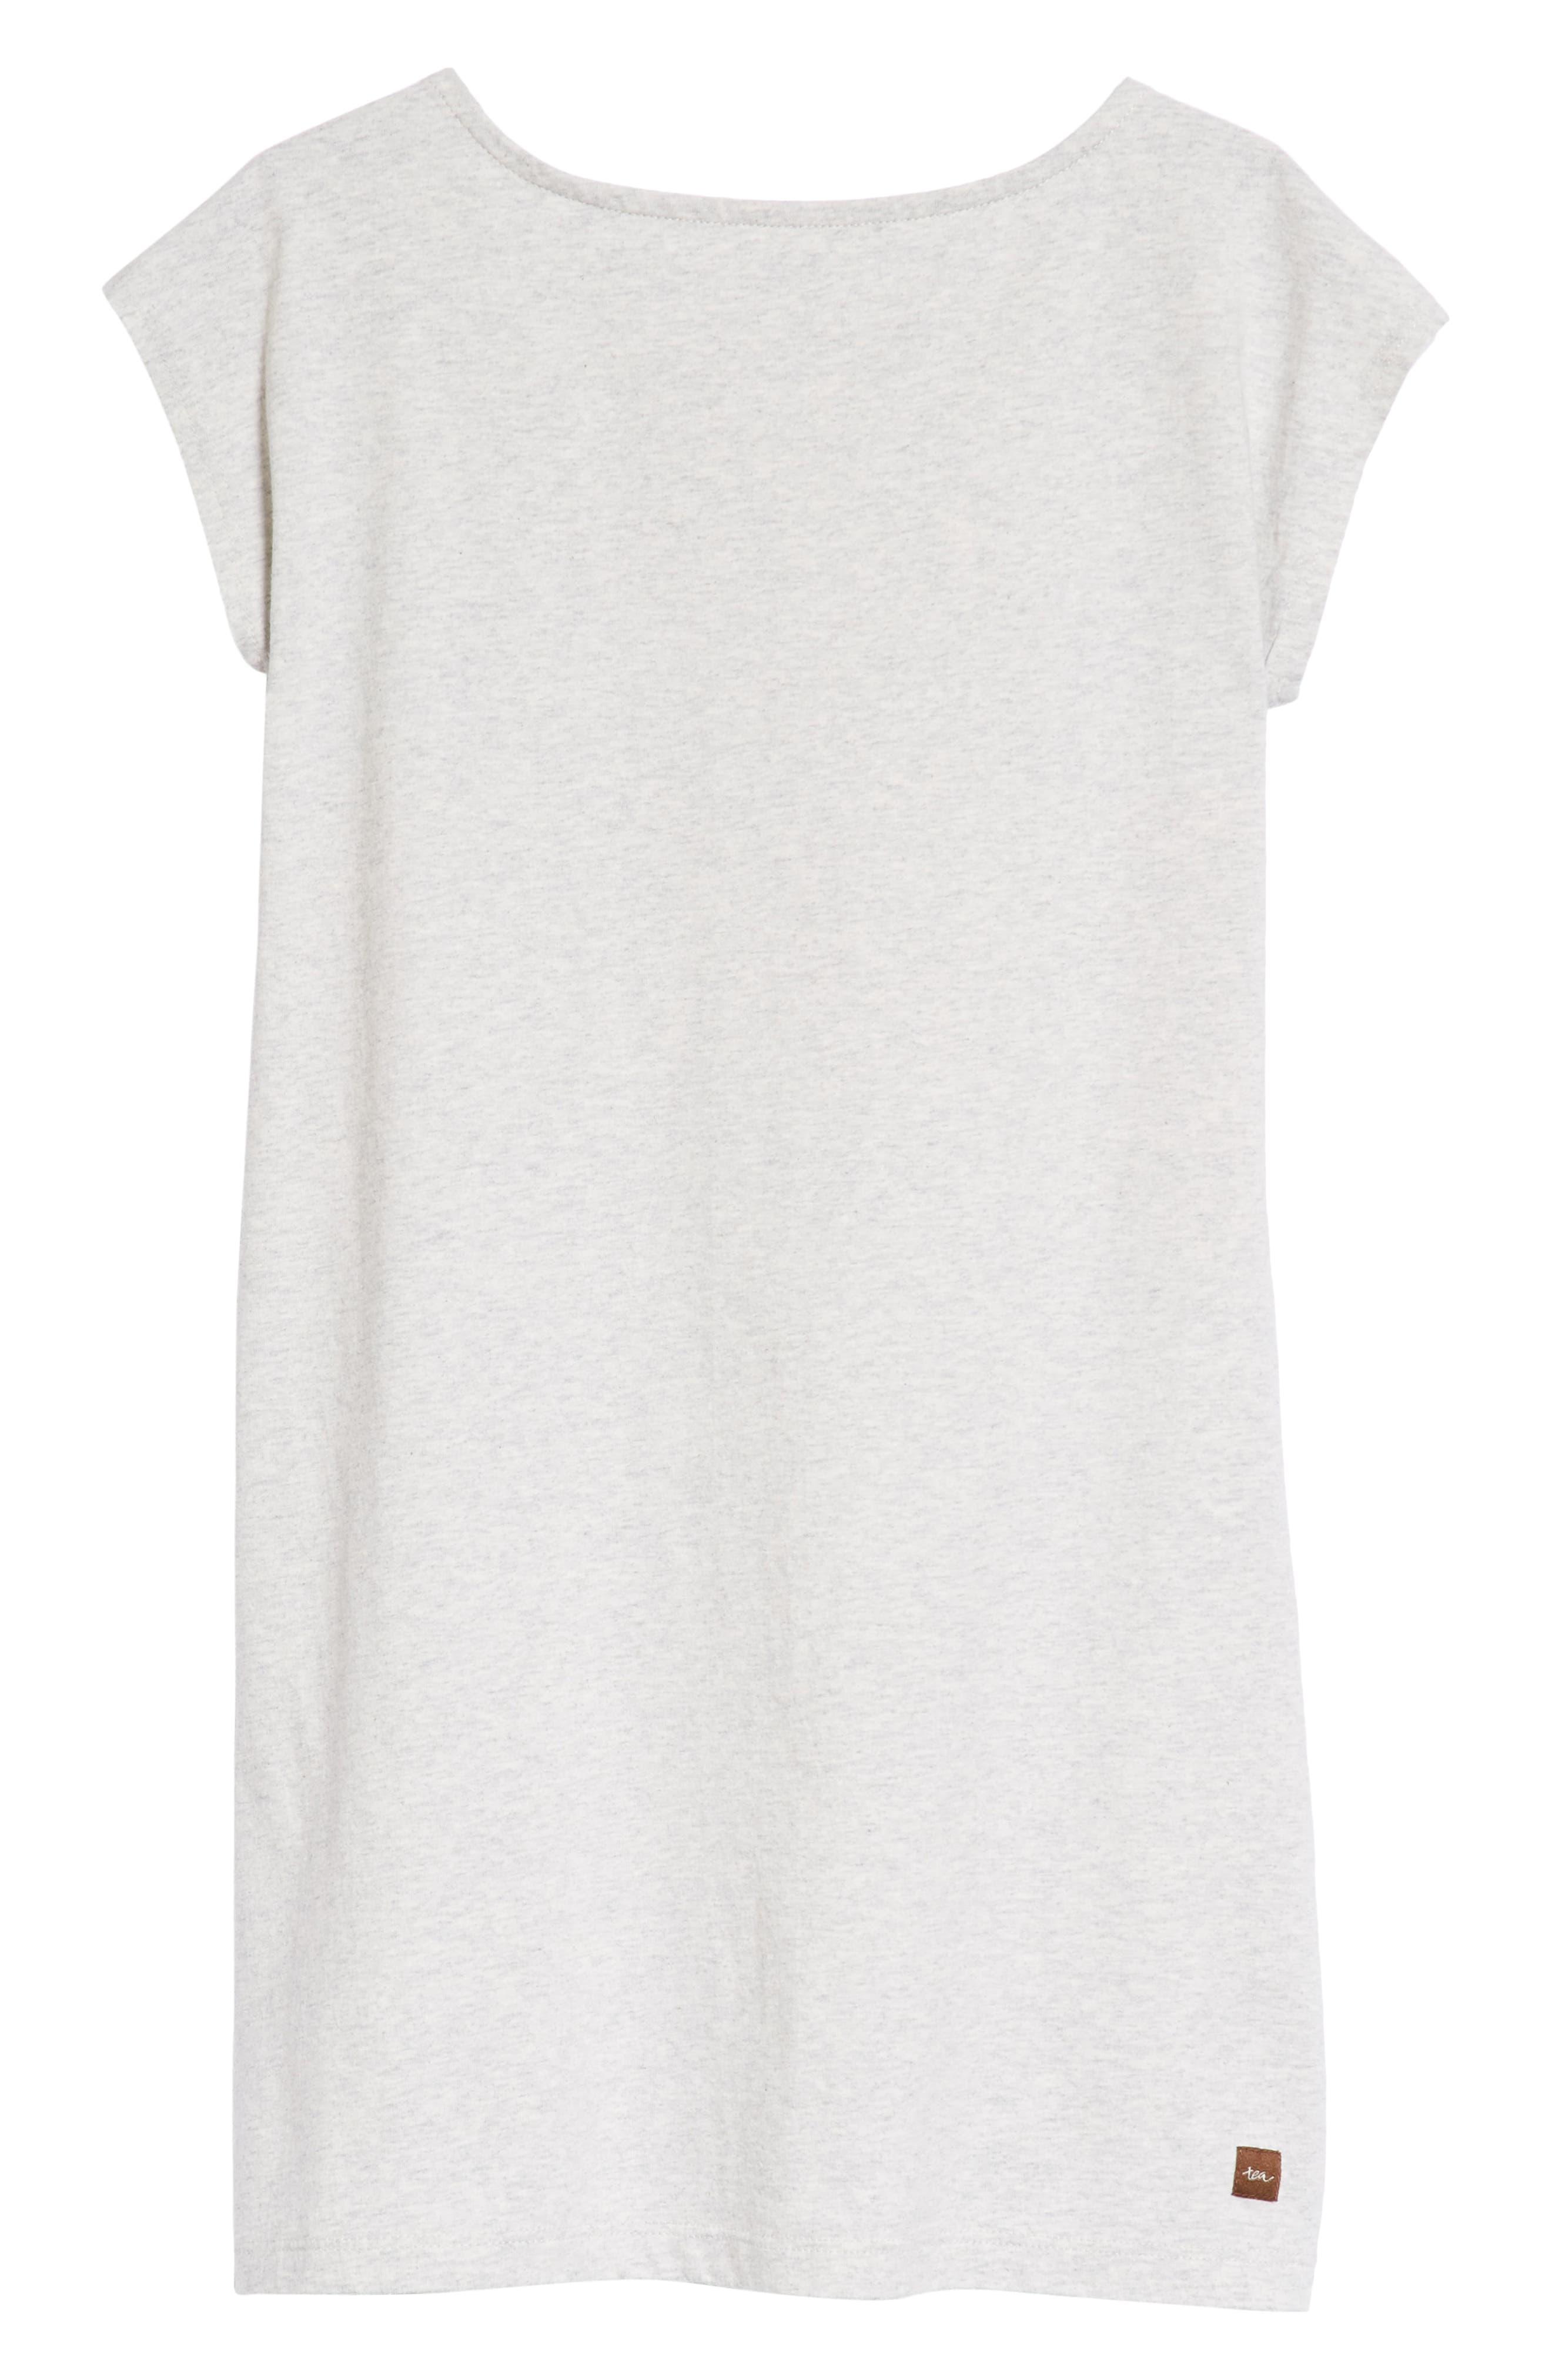 Flamingo T-Shirt Dress,                             Alternate thumbnail 2, color,                             100